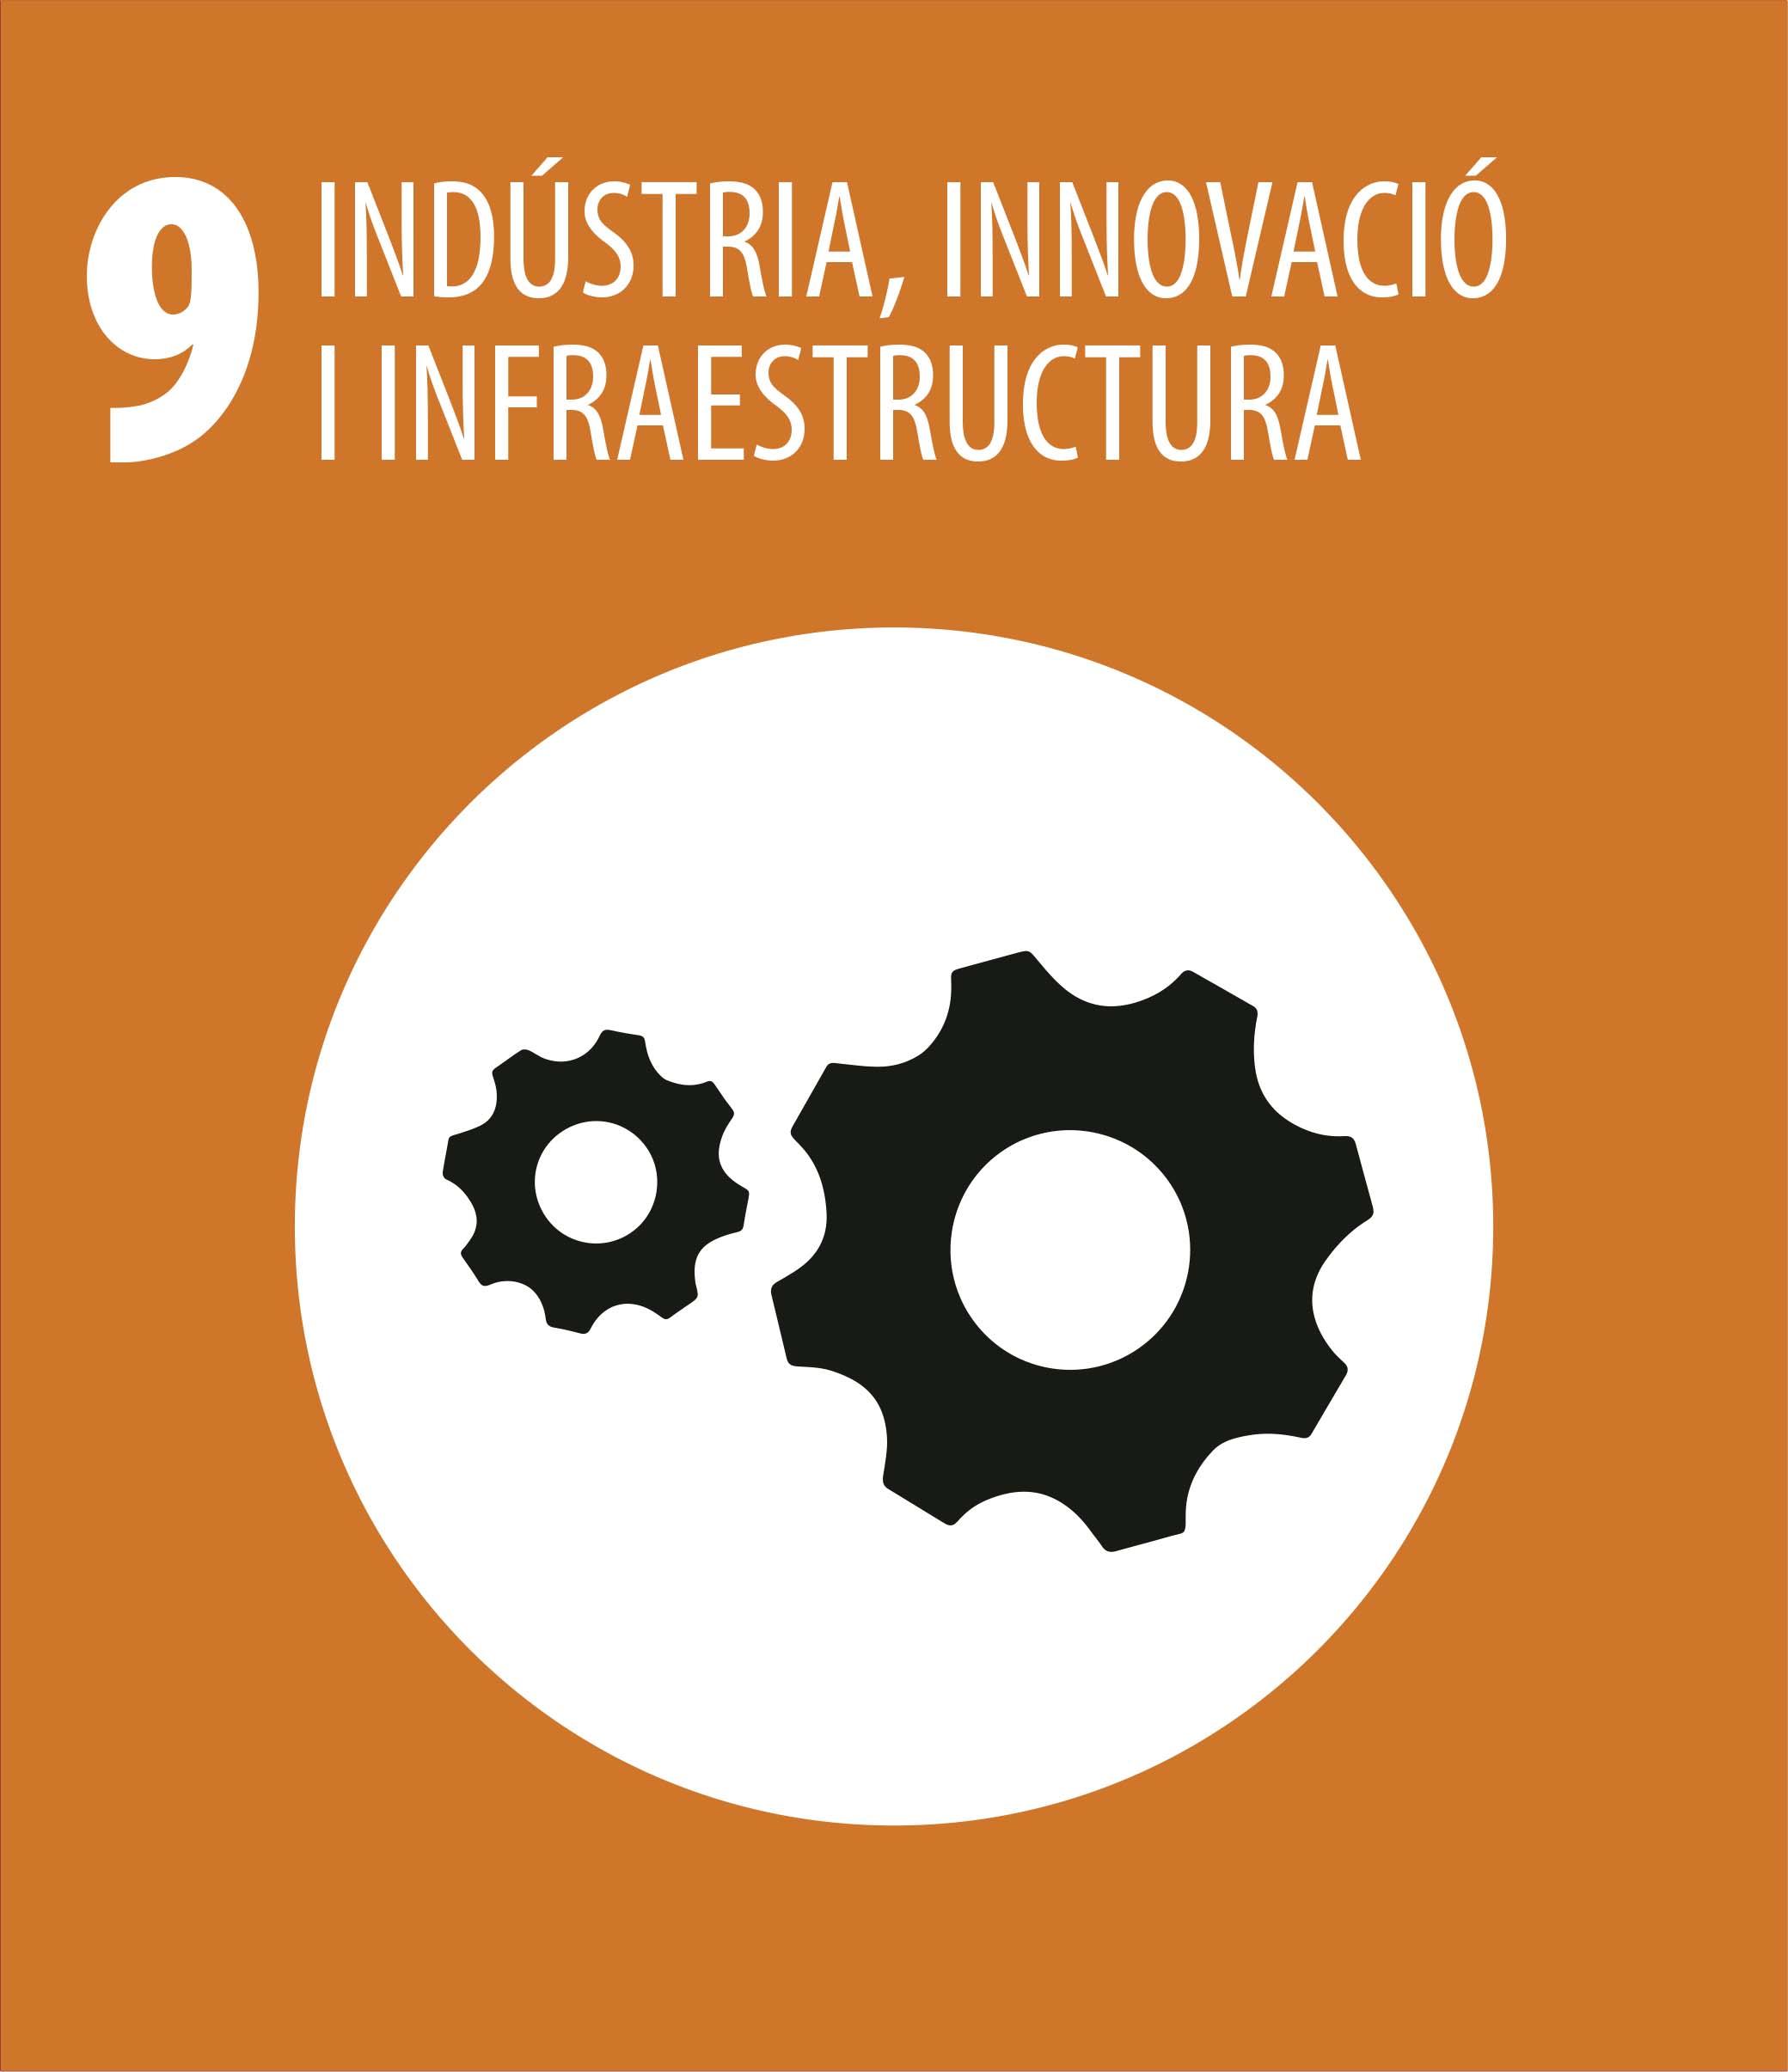 ODS 9 Industria innovacio infraestructura